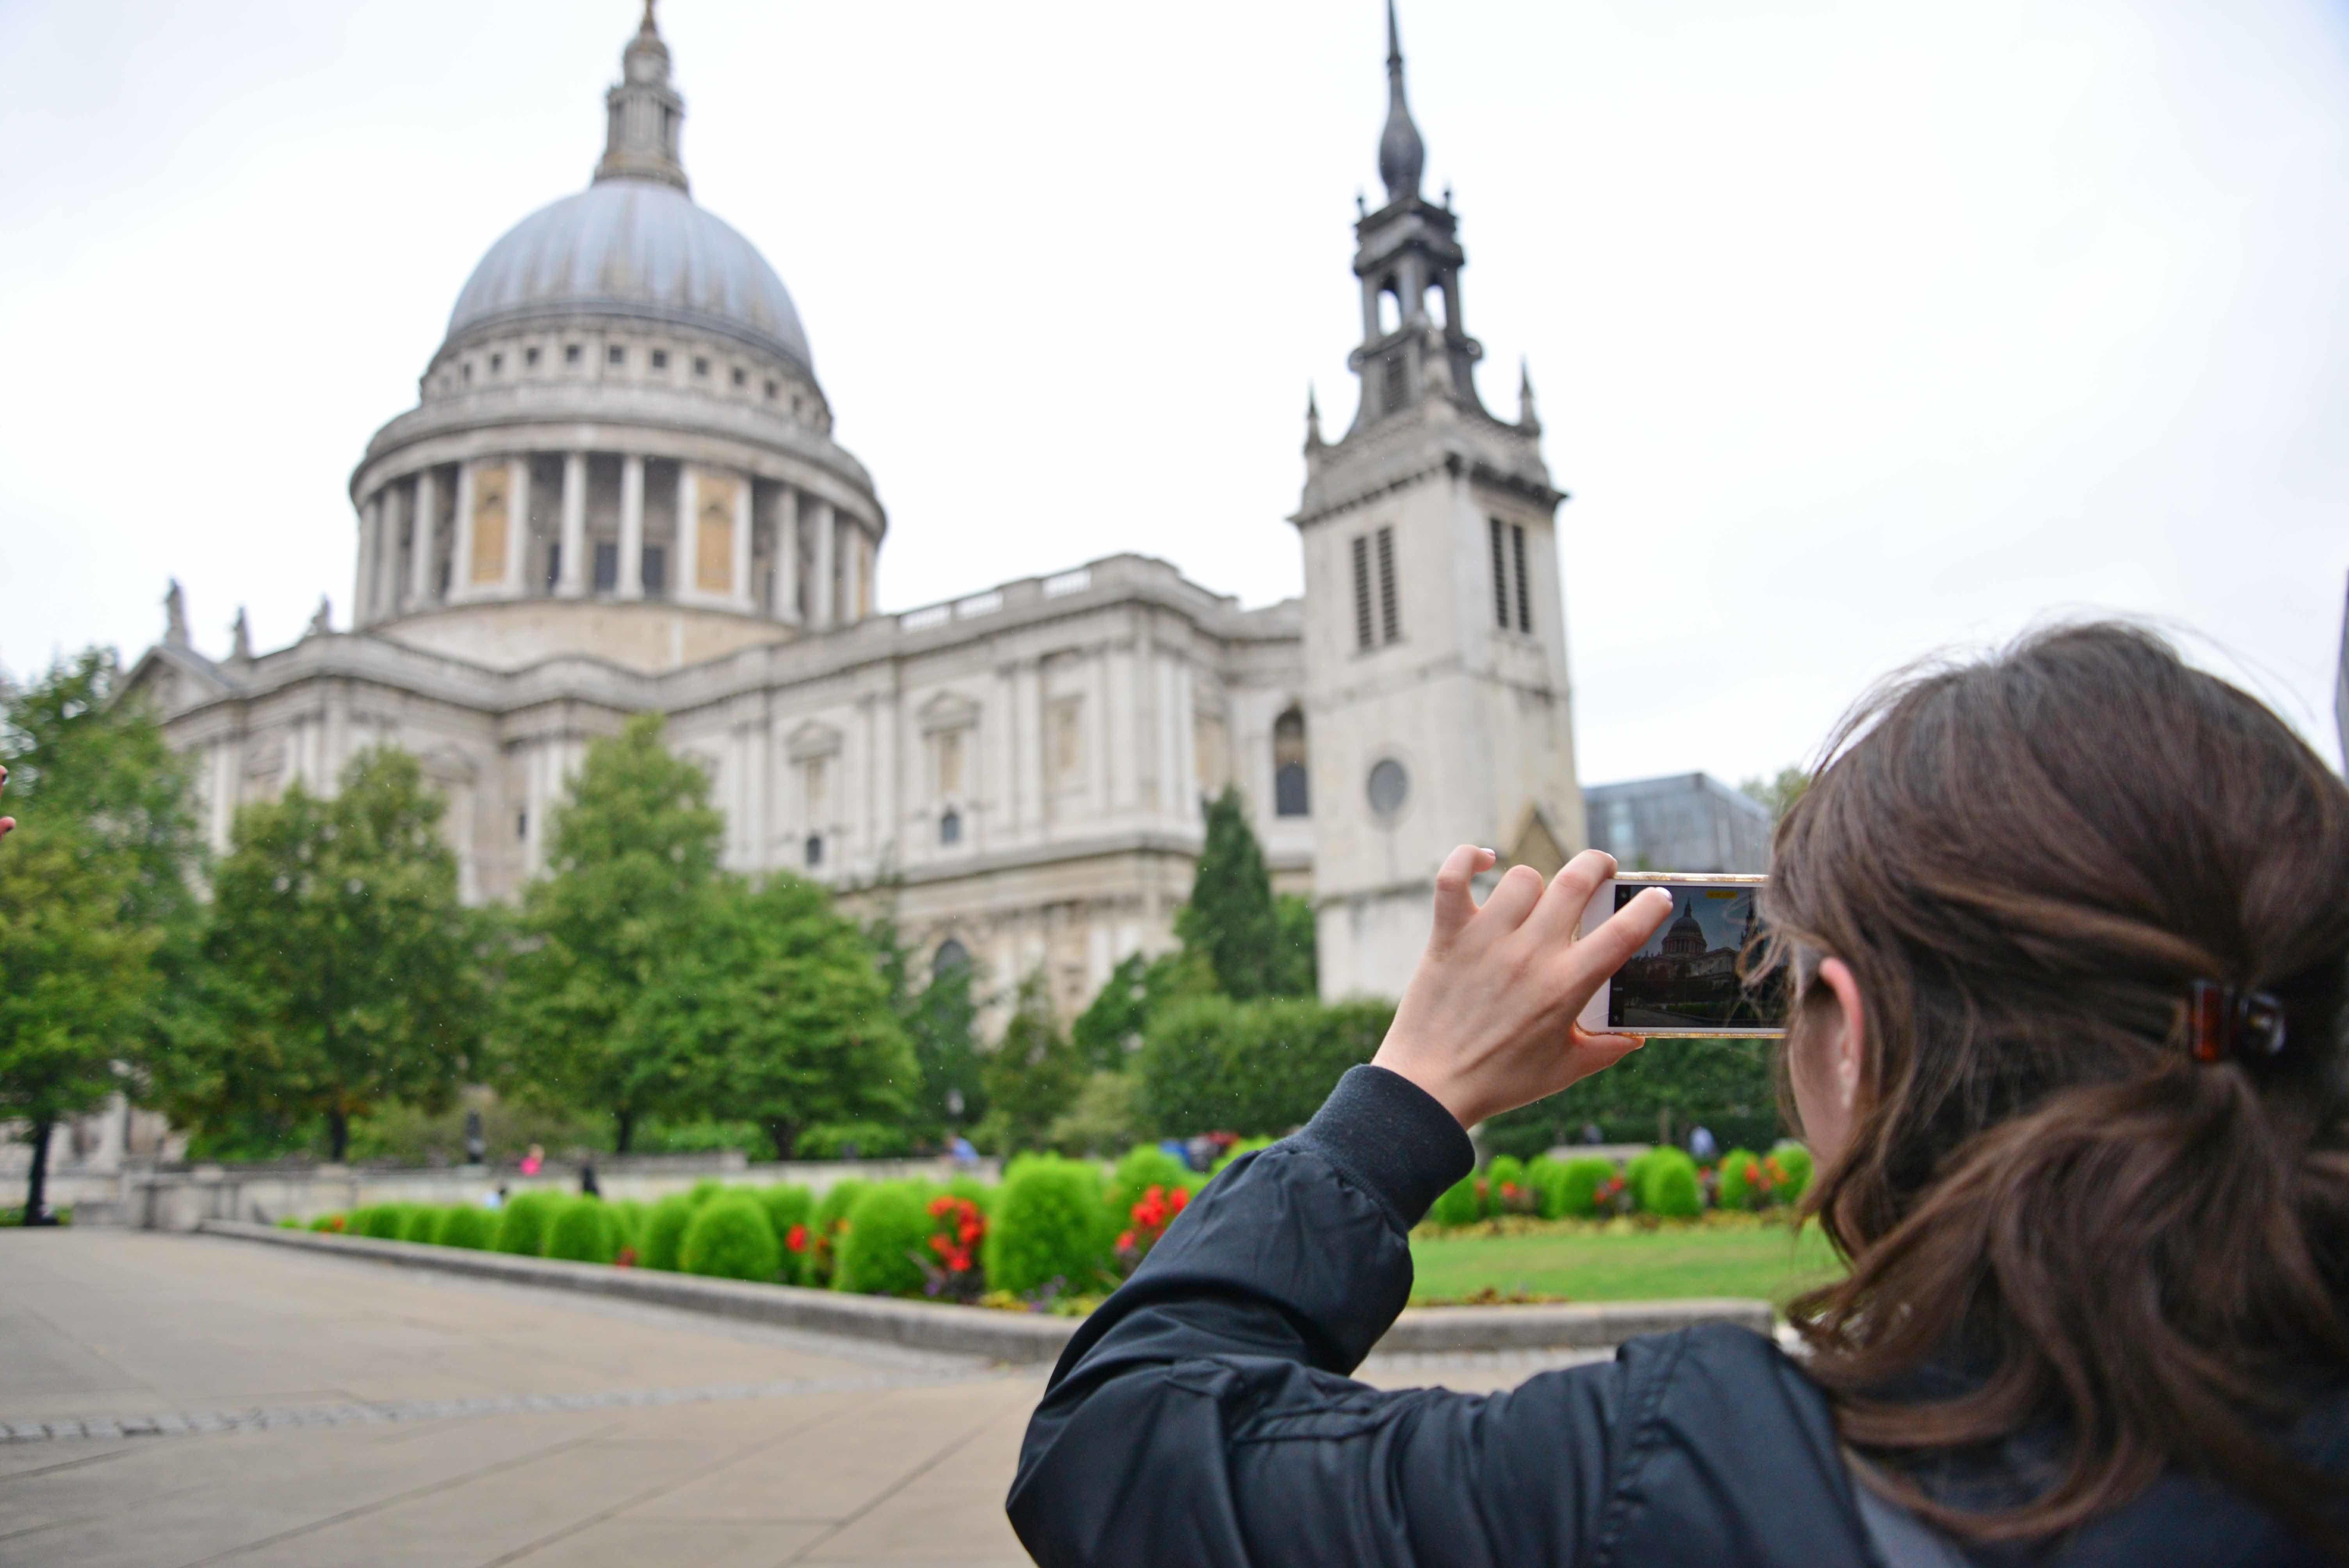 London Travel, Events, Experiences & Socialising Meetup